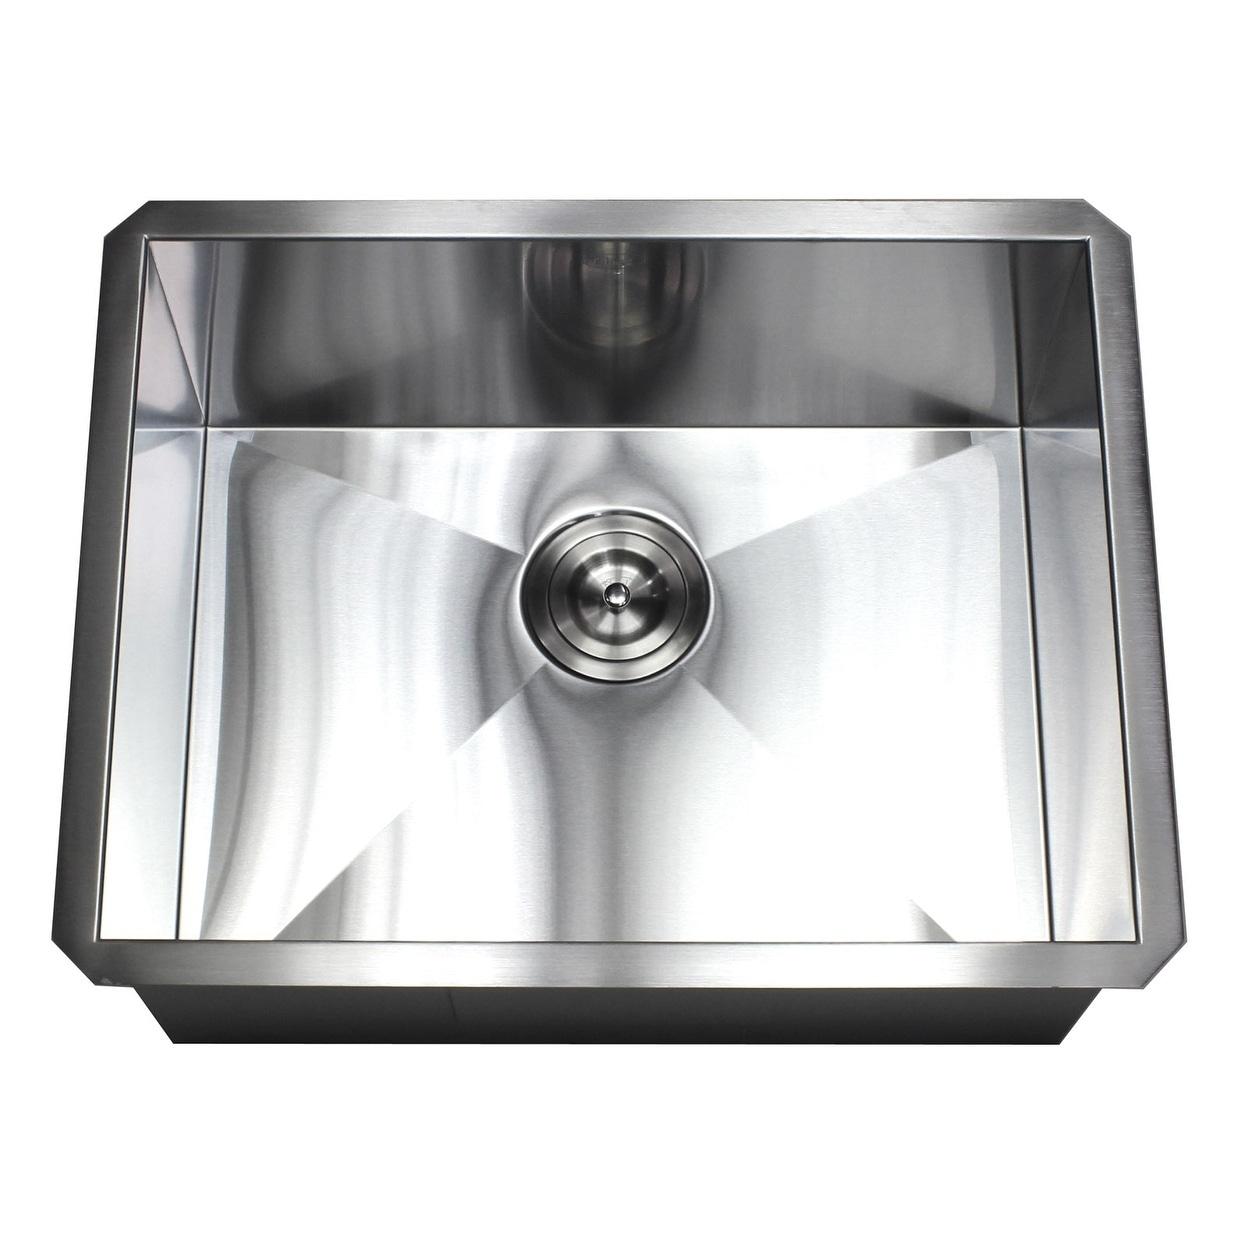 Shop 23 Inch Stainless Steel 16 Gauge Single Bowl Undermount Zero Radius  Kitchen Island Bar Sink   On Sale   Free Shipping Today   Overstock    20221045